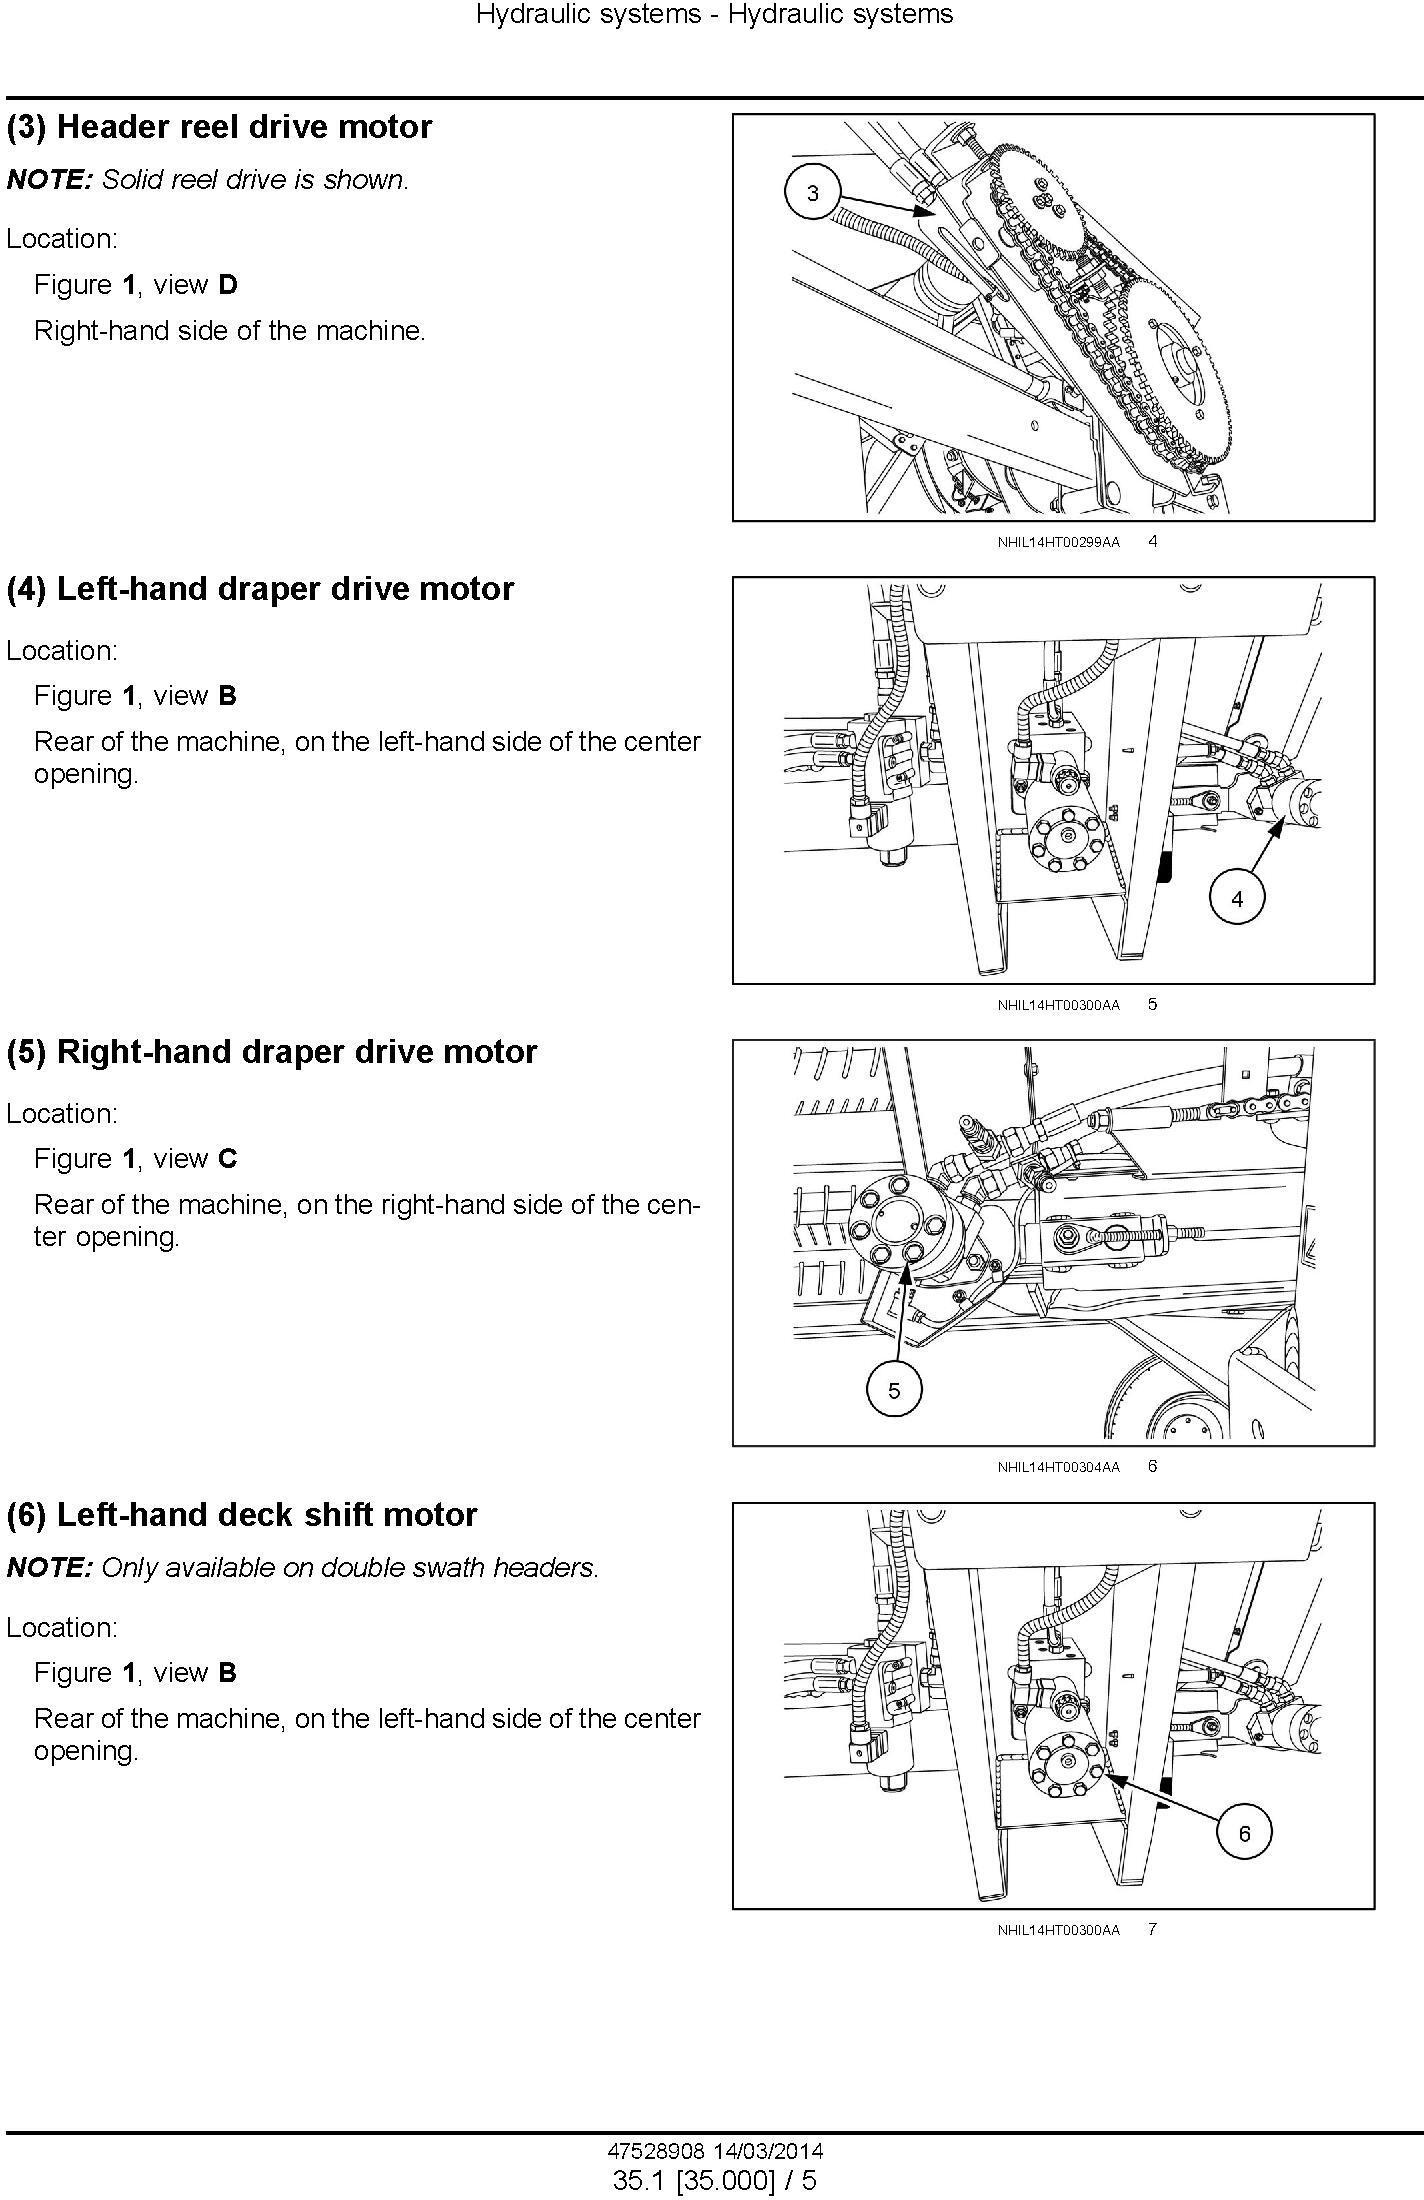 New Holland DuraSwath 425HB, 430HB, 436HB, 440HB Draper Header Service Manual - 1